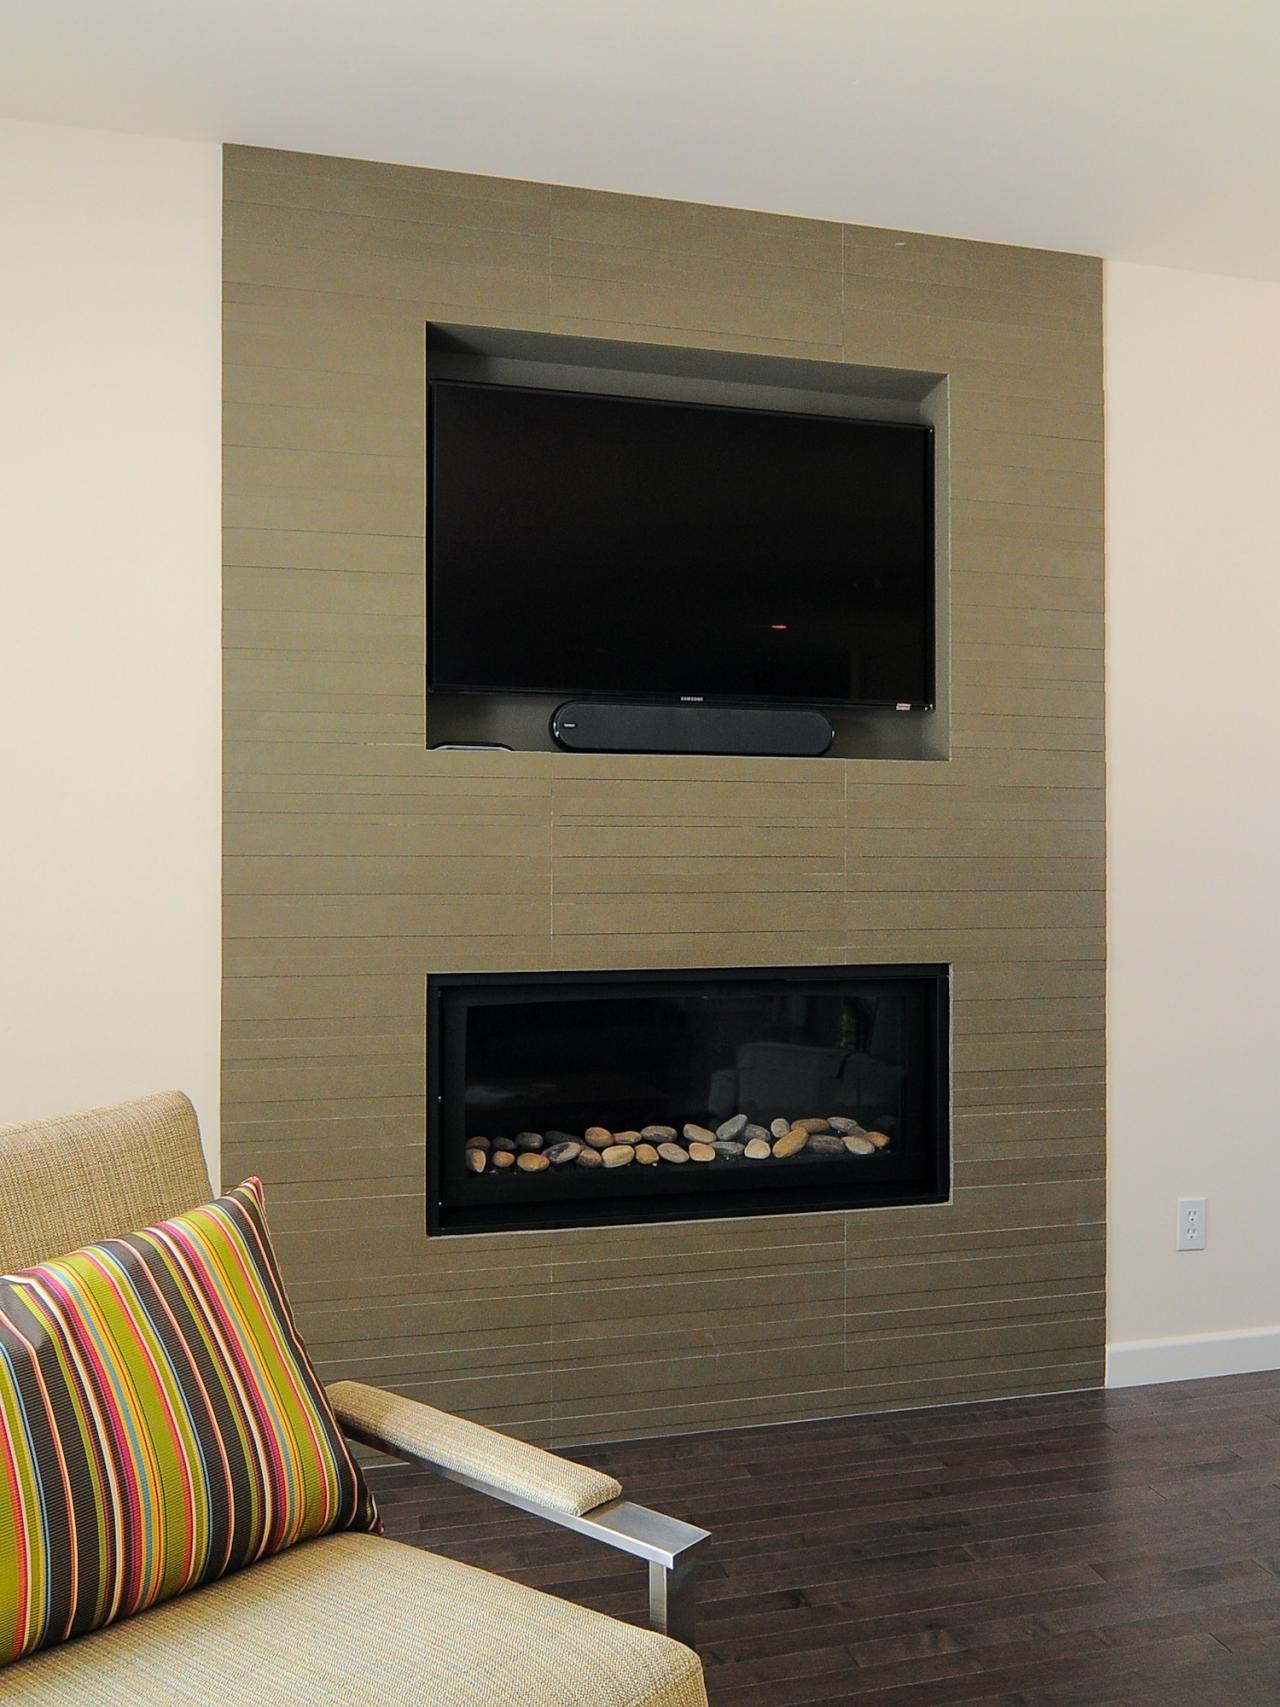 tv above fireplace uk - google search | lounge ideas | pinterest